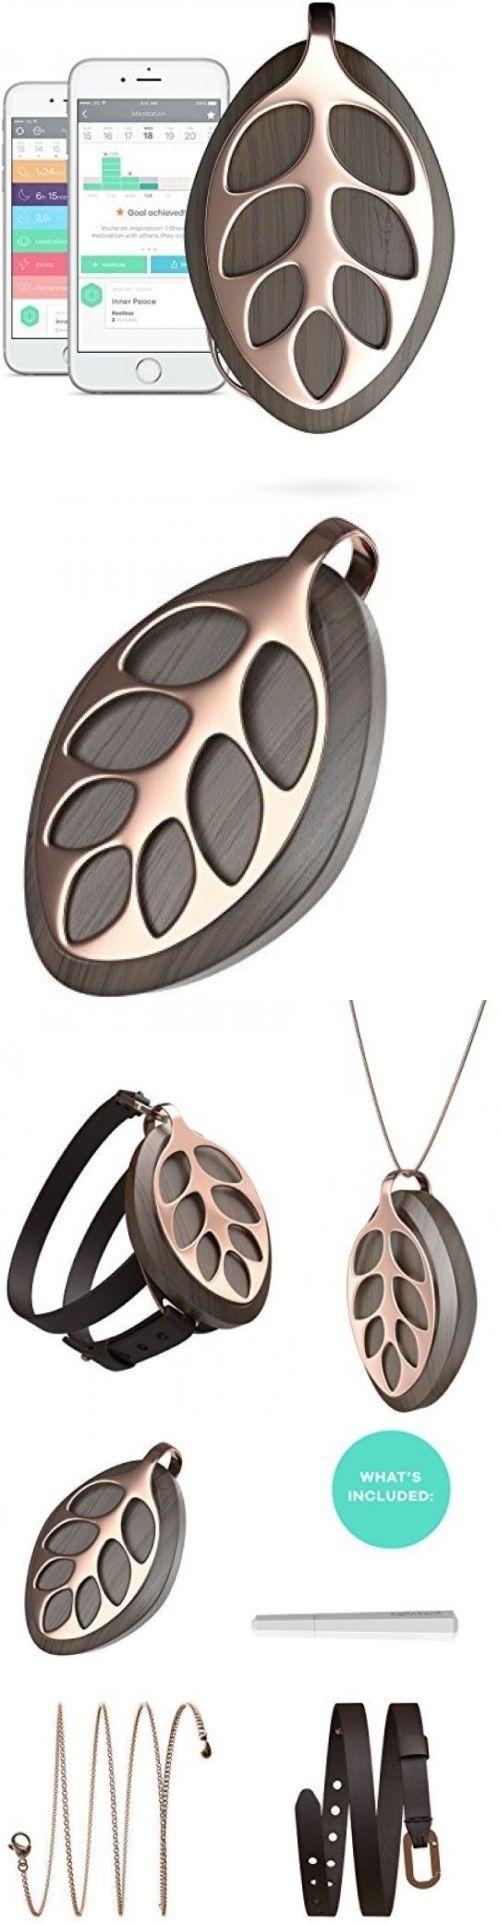 Pedometers 44077 Bellabeat Leaf Health TrackerSmart Jewelry